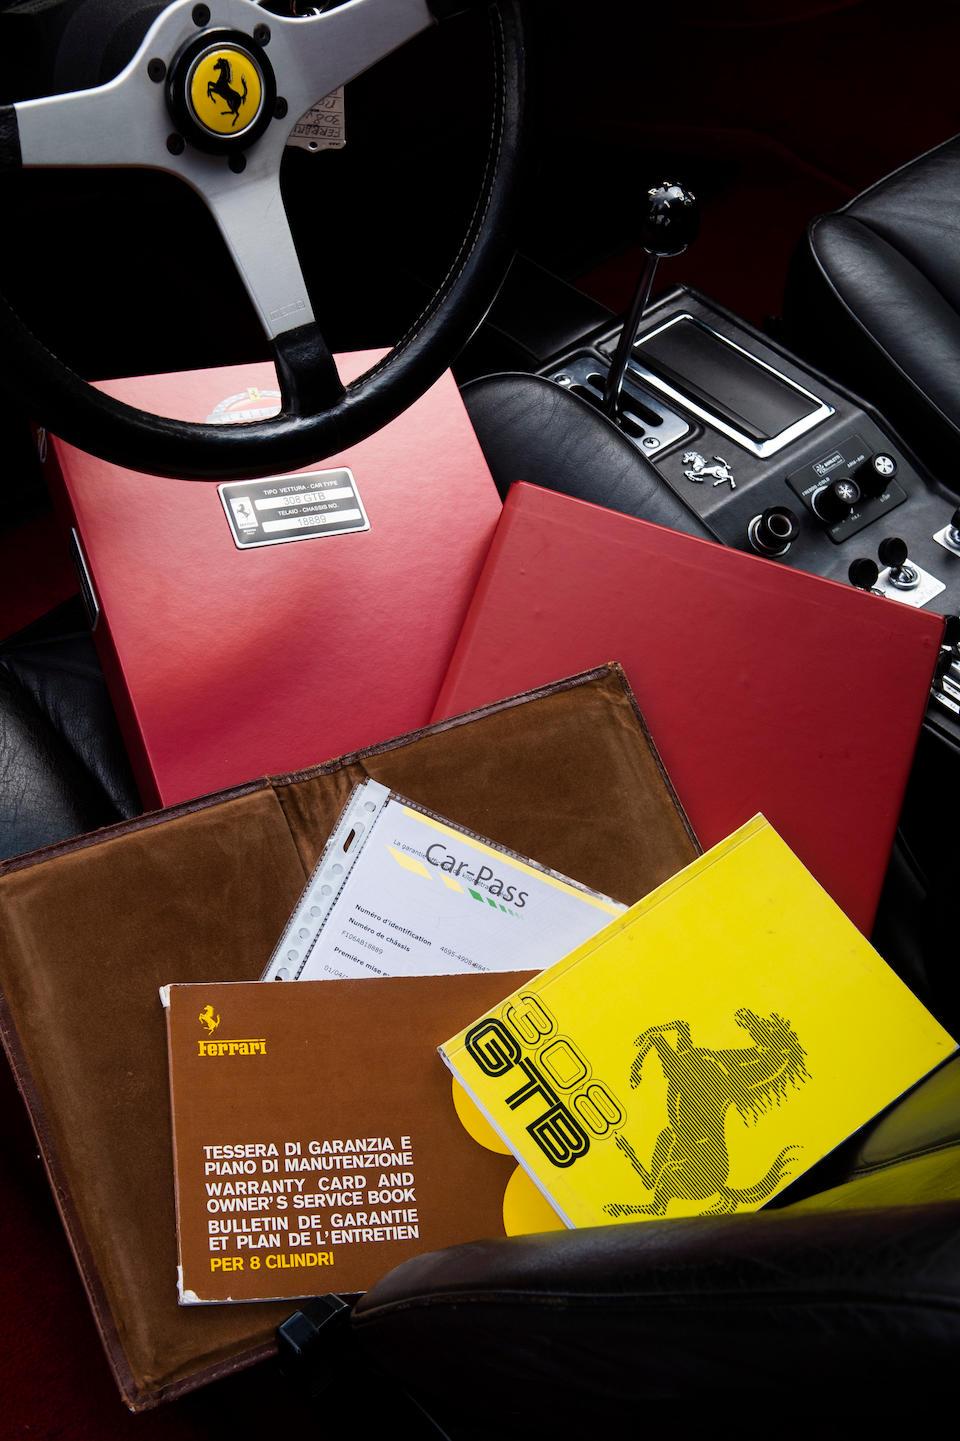 Ferrari Classiche certified,1976 Ferrari 308 GTB Vetroresina   Chassis no. F106 AB 18889